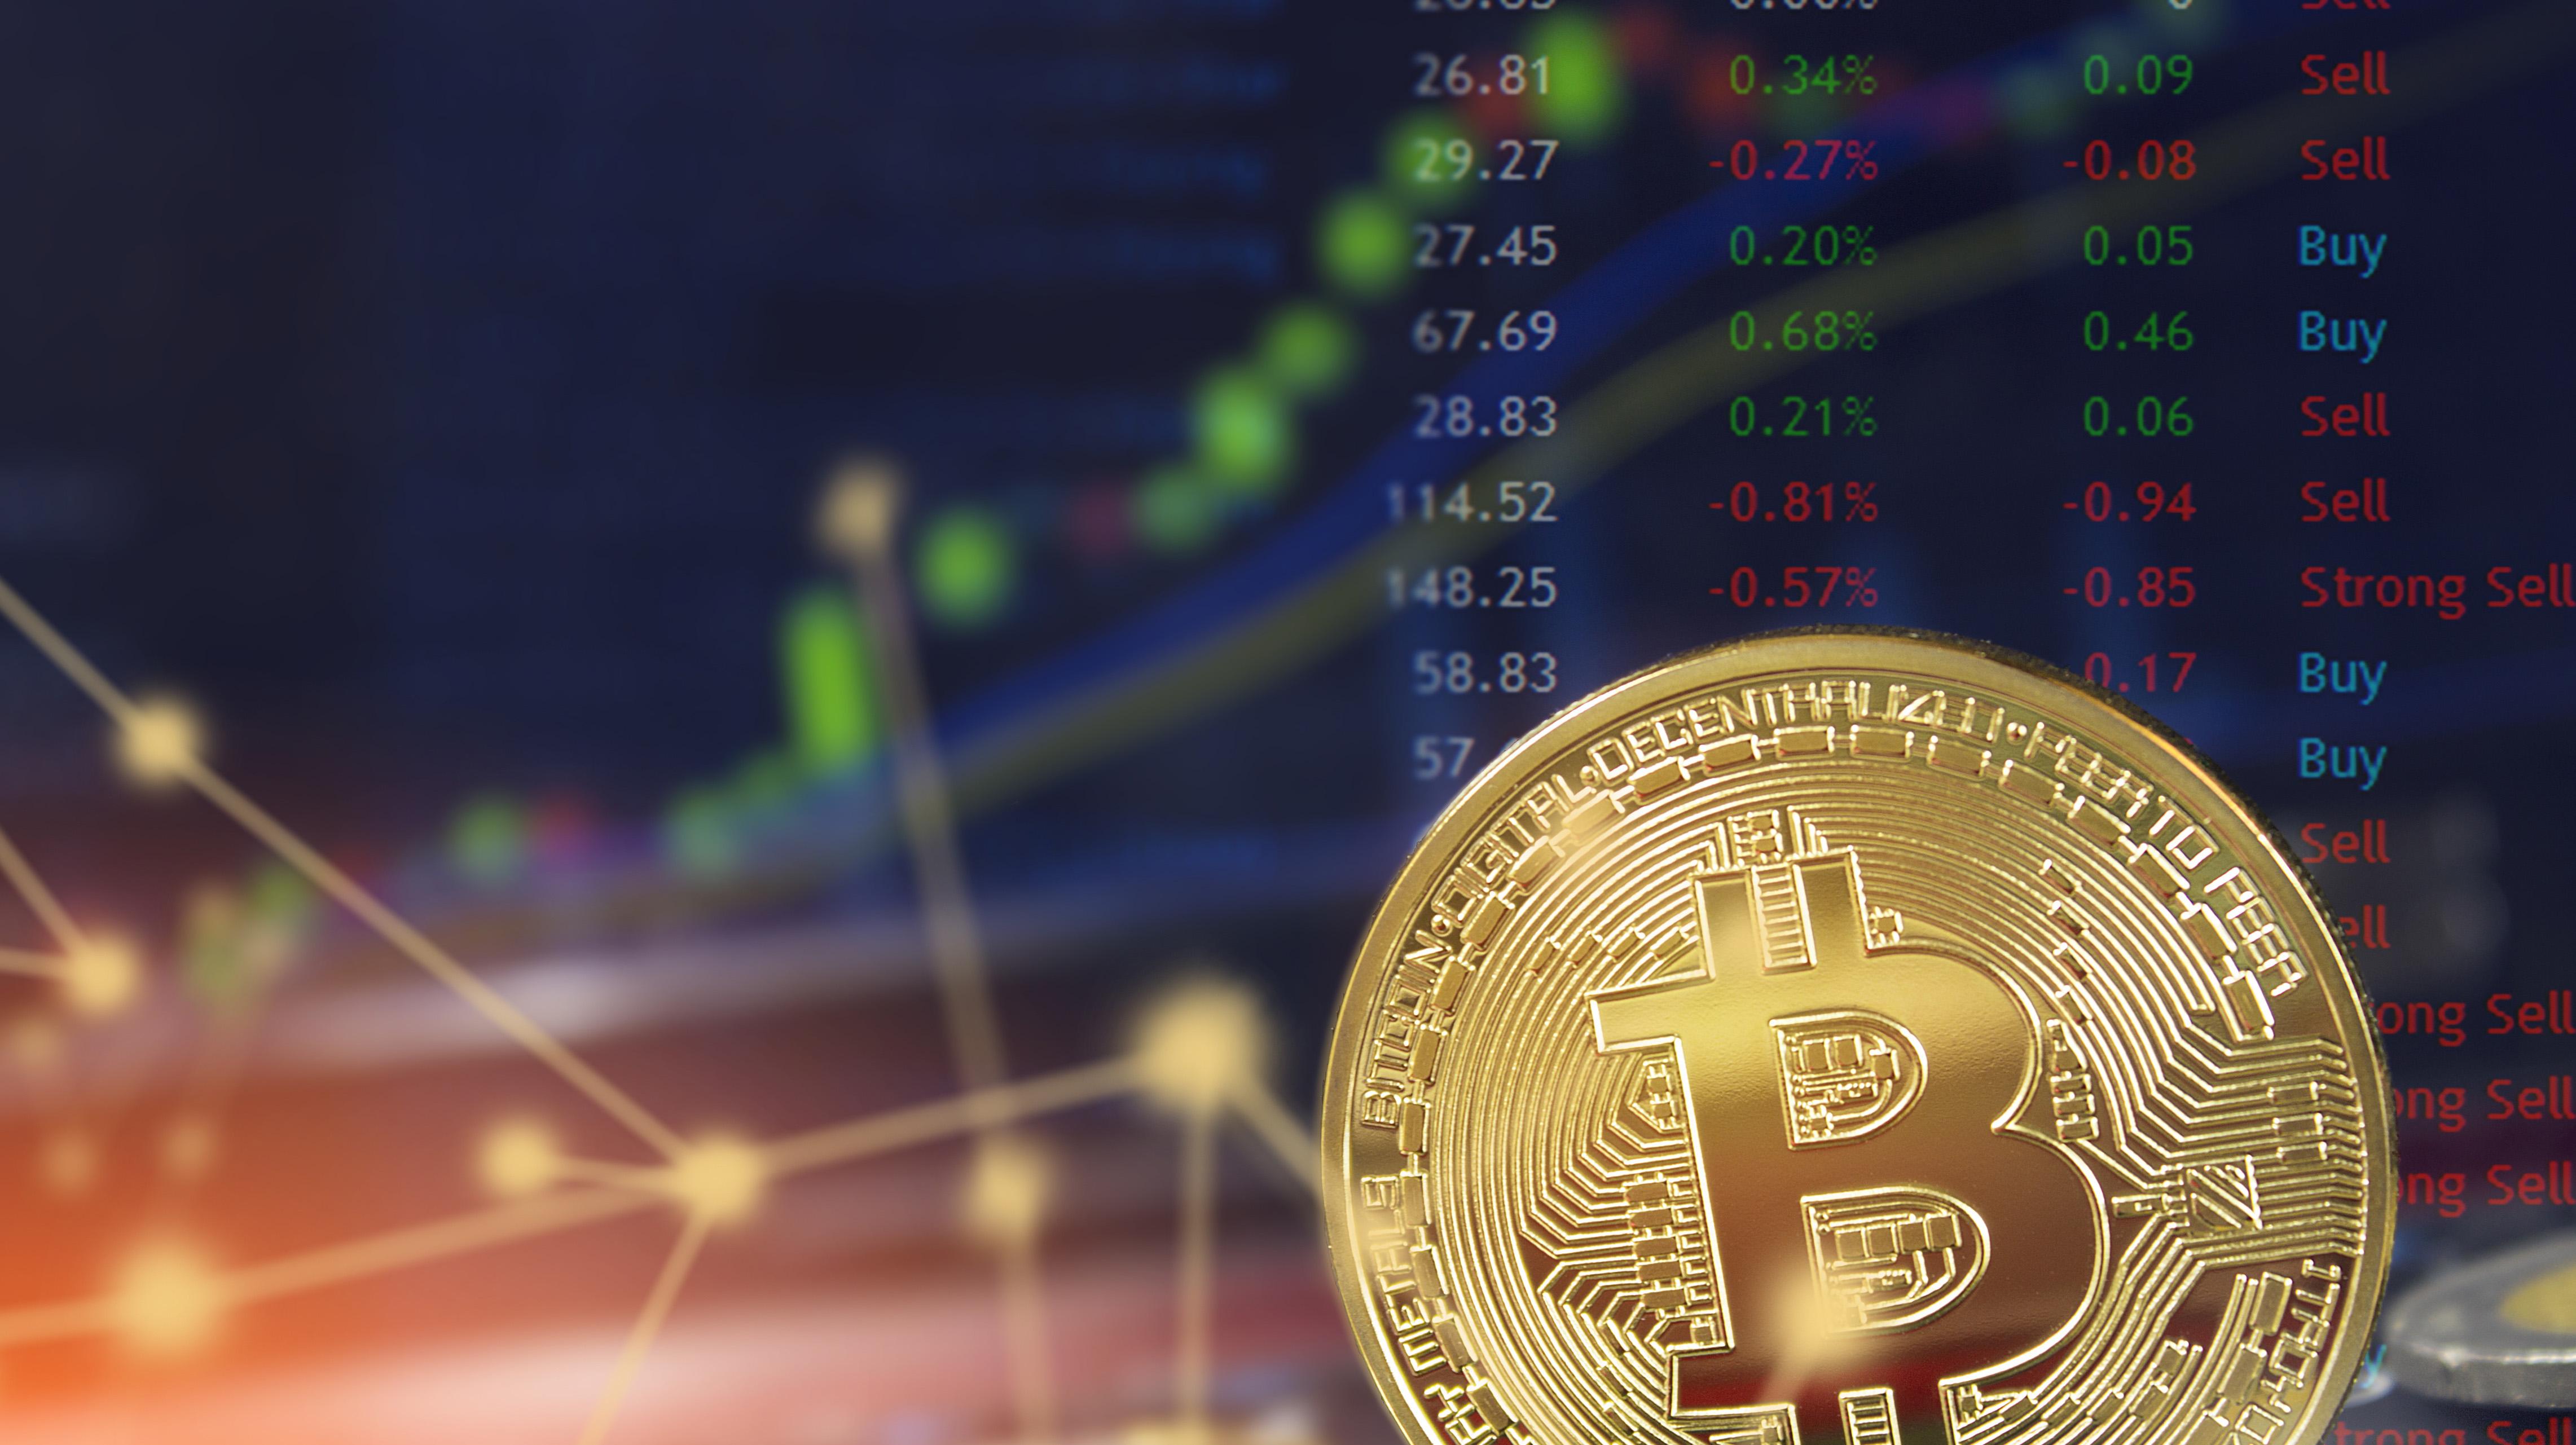 reasons for bitcoin surge